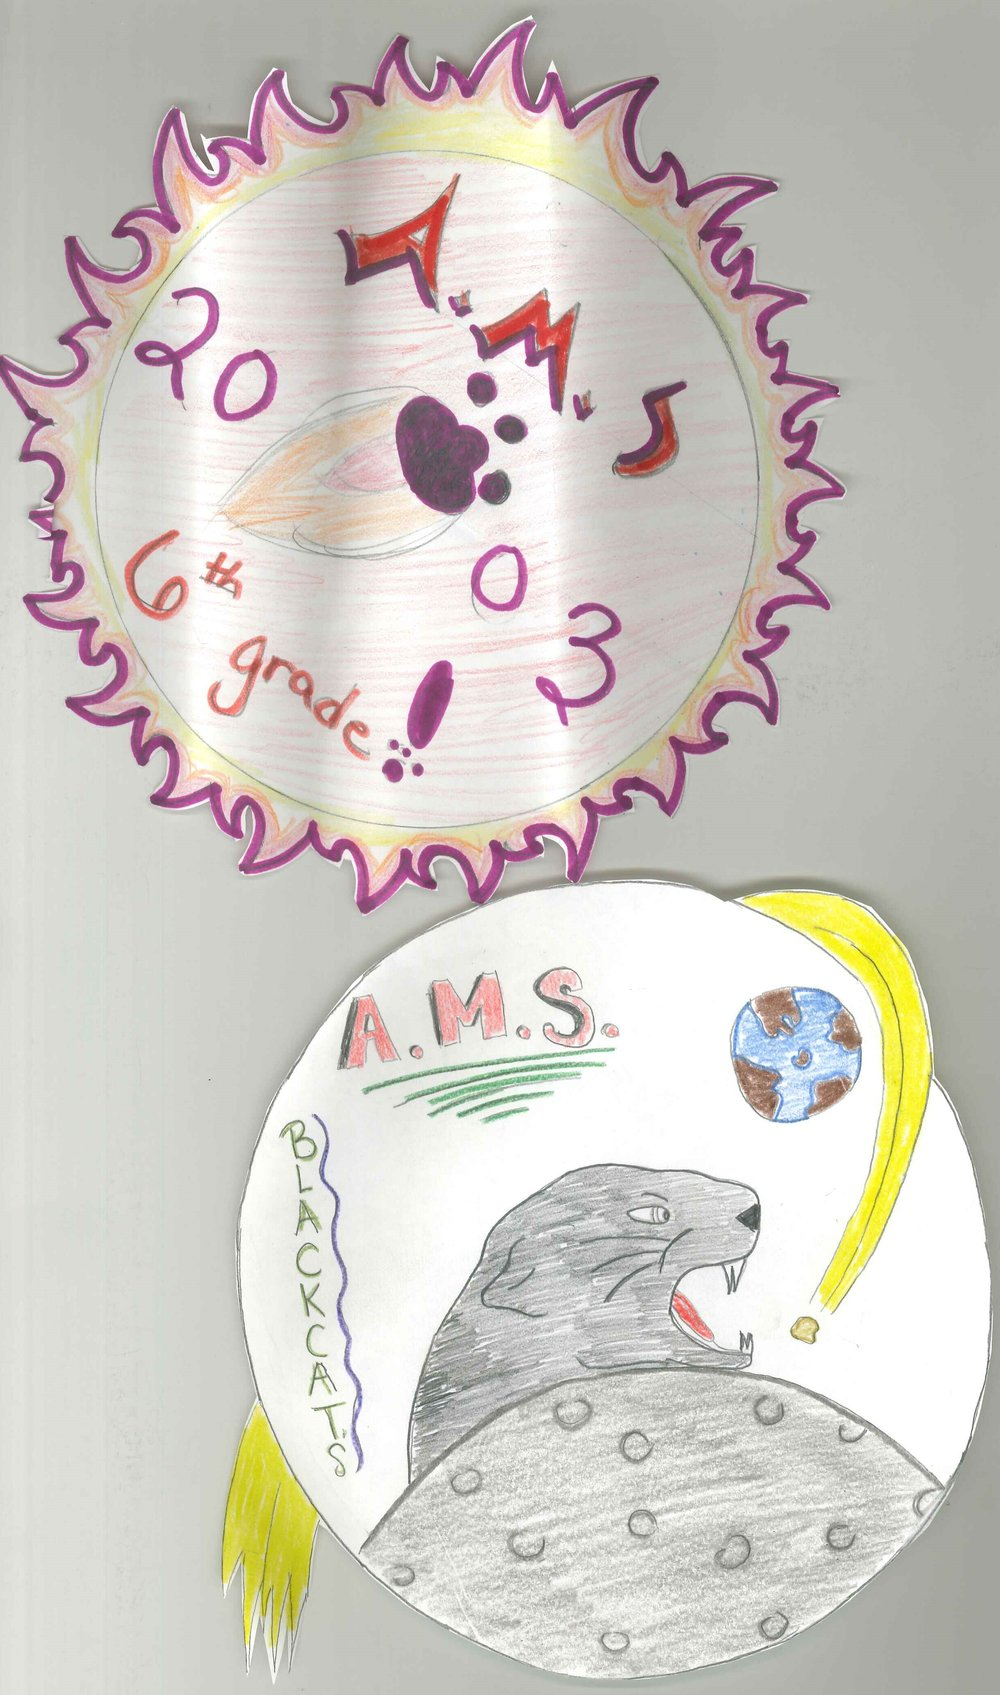 2003 AMS 6th grade patch designs.jpg